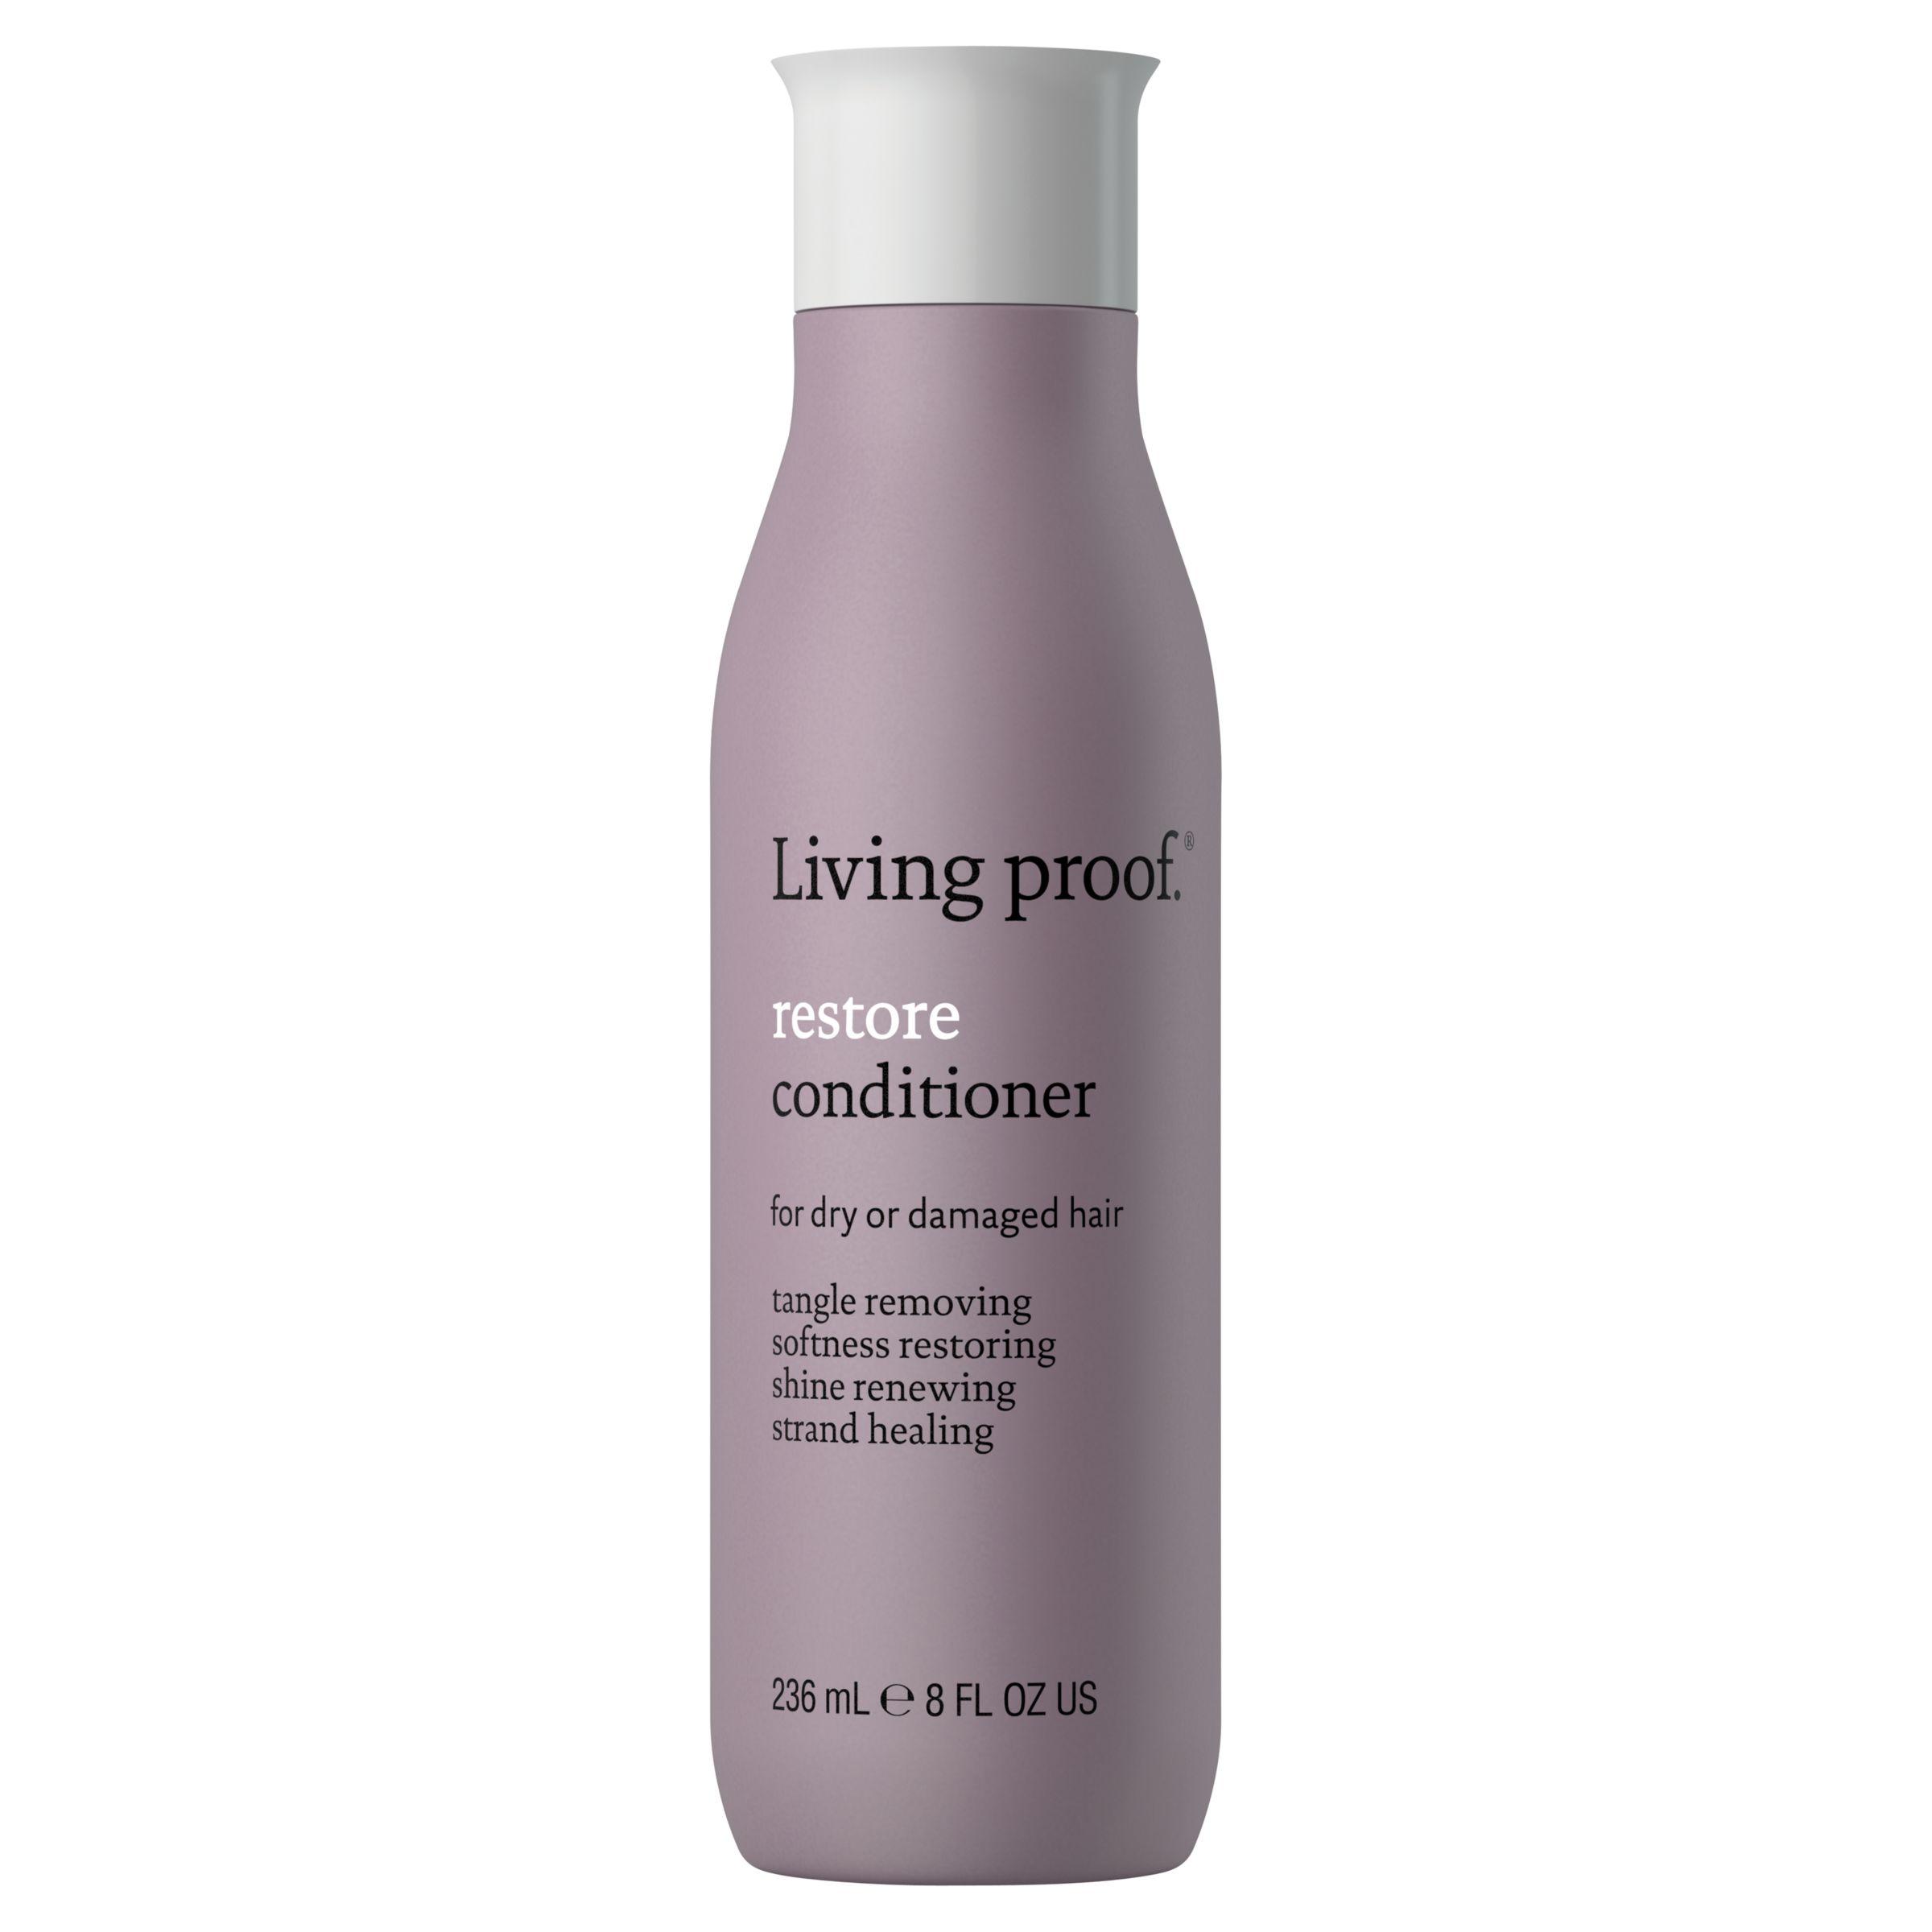 Living Proof Living Proof Restore Conditioner, 236ml